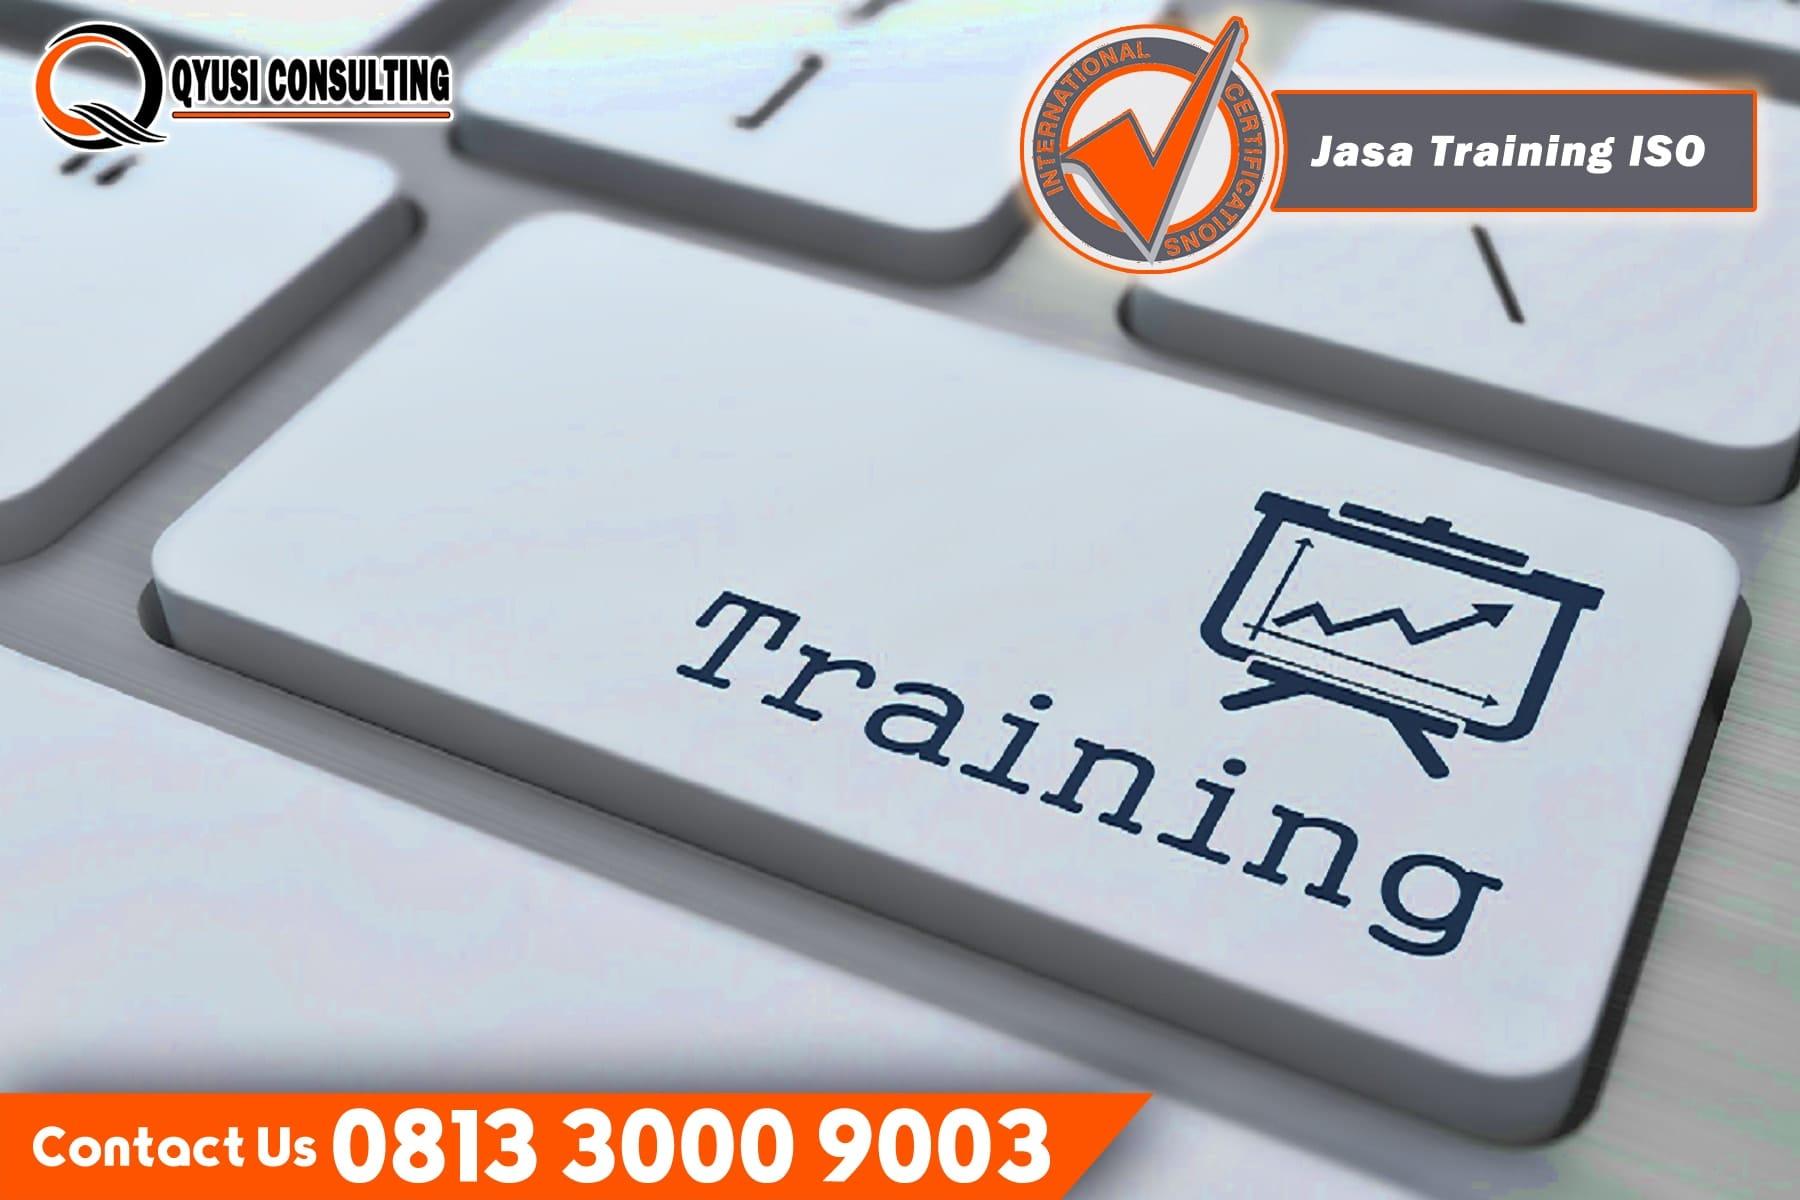 Jasa pelatihan ISO training iso Terbaik Harga Kompetitif